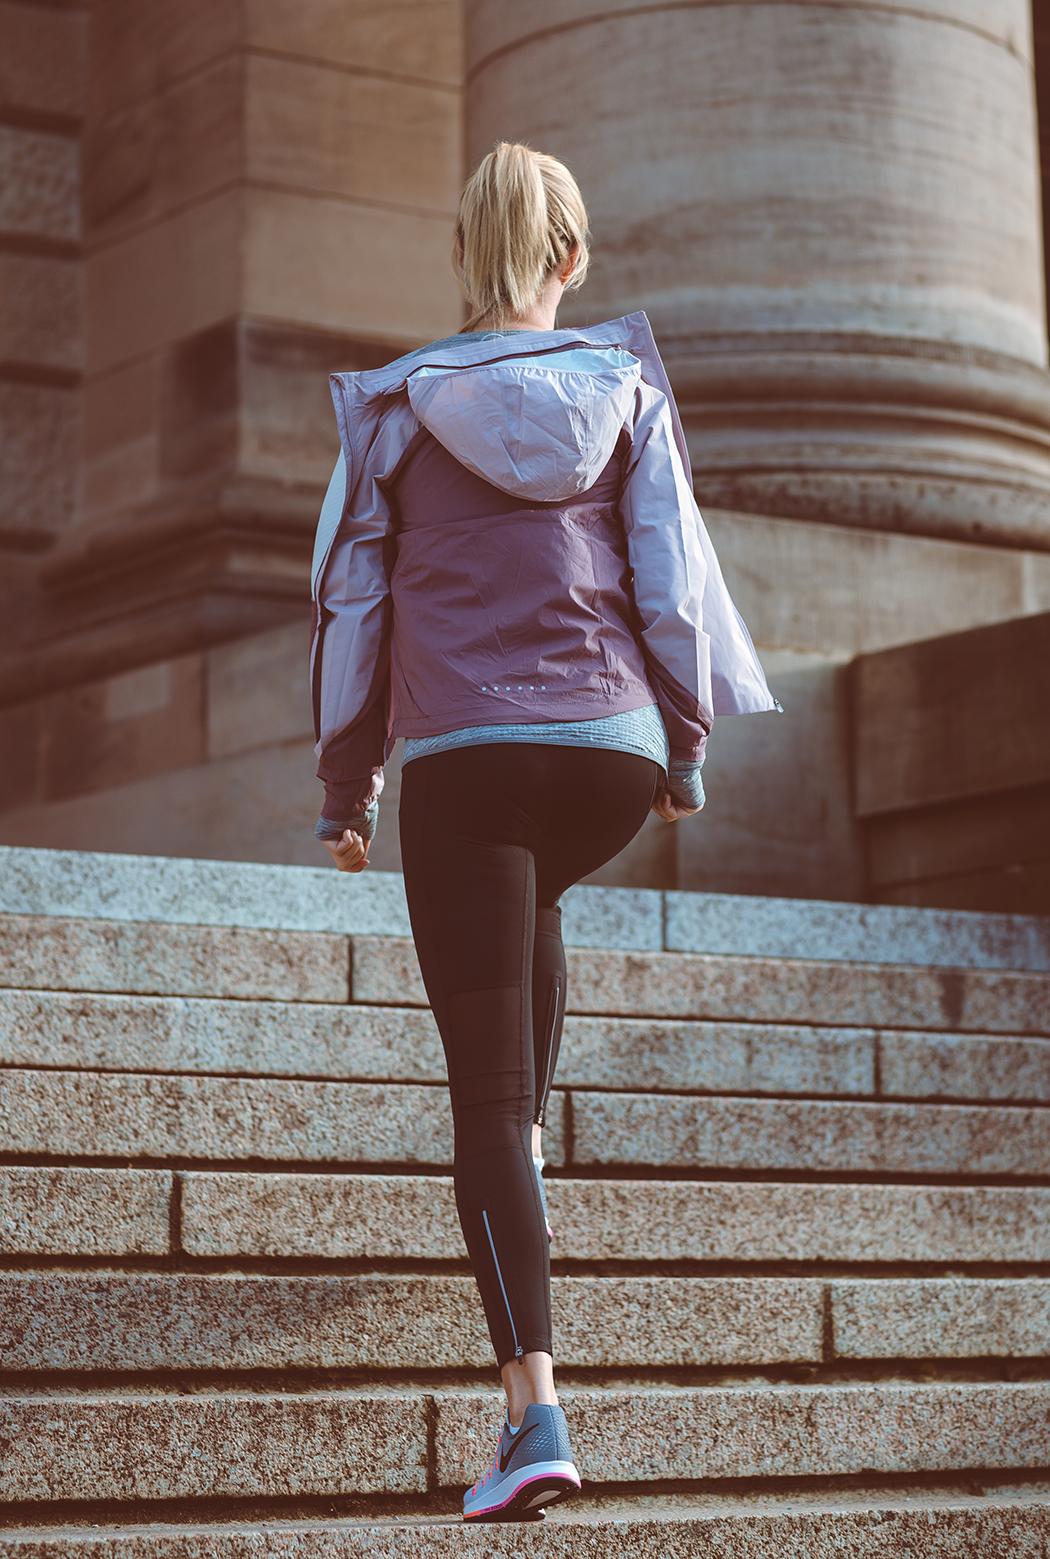 fitnessblog-fitnessblogger-fitness-blog-blogger-sport-sportblog-lindarella-nike-running-munich-105-web